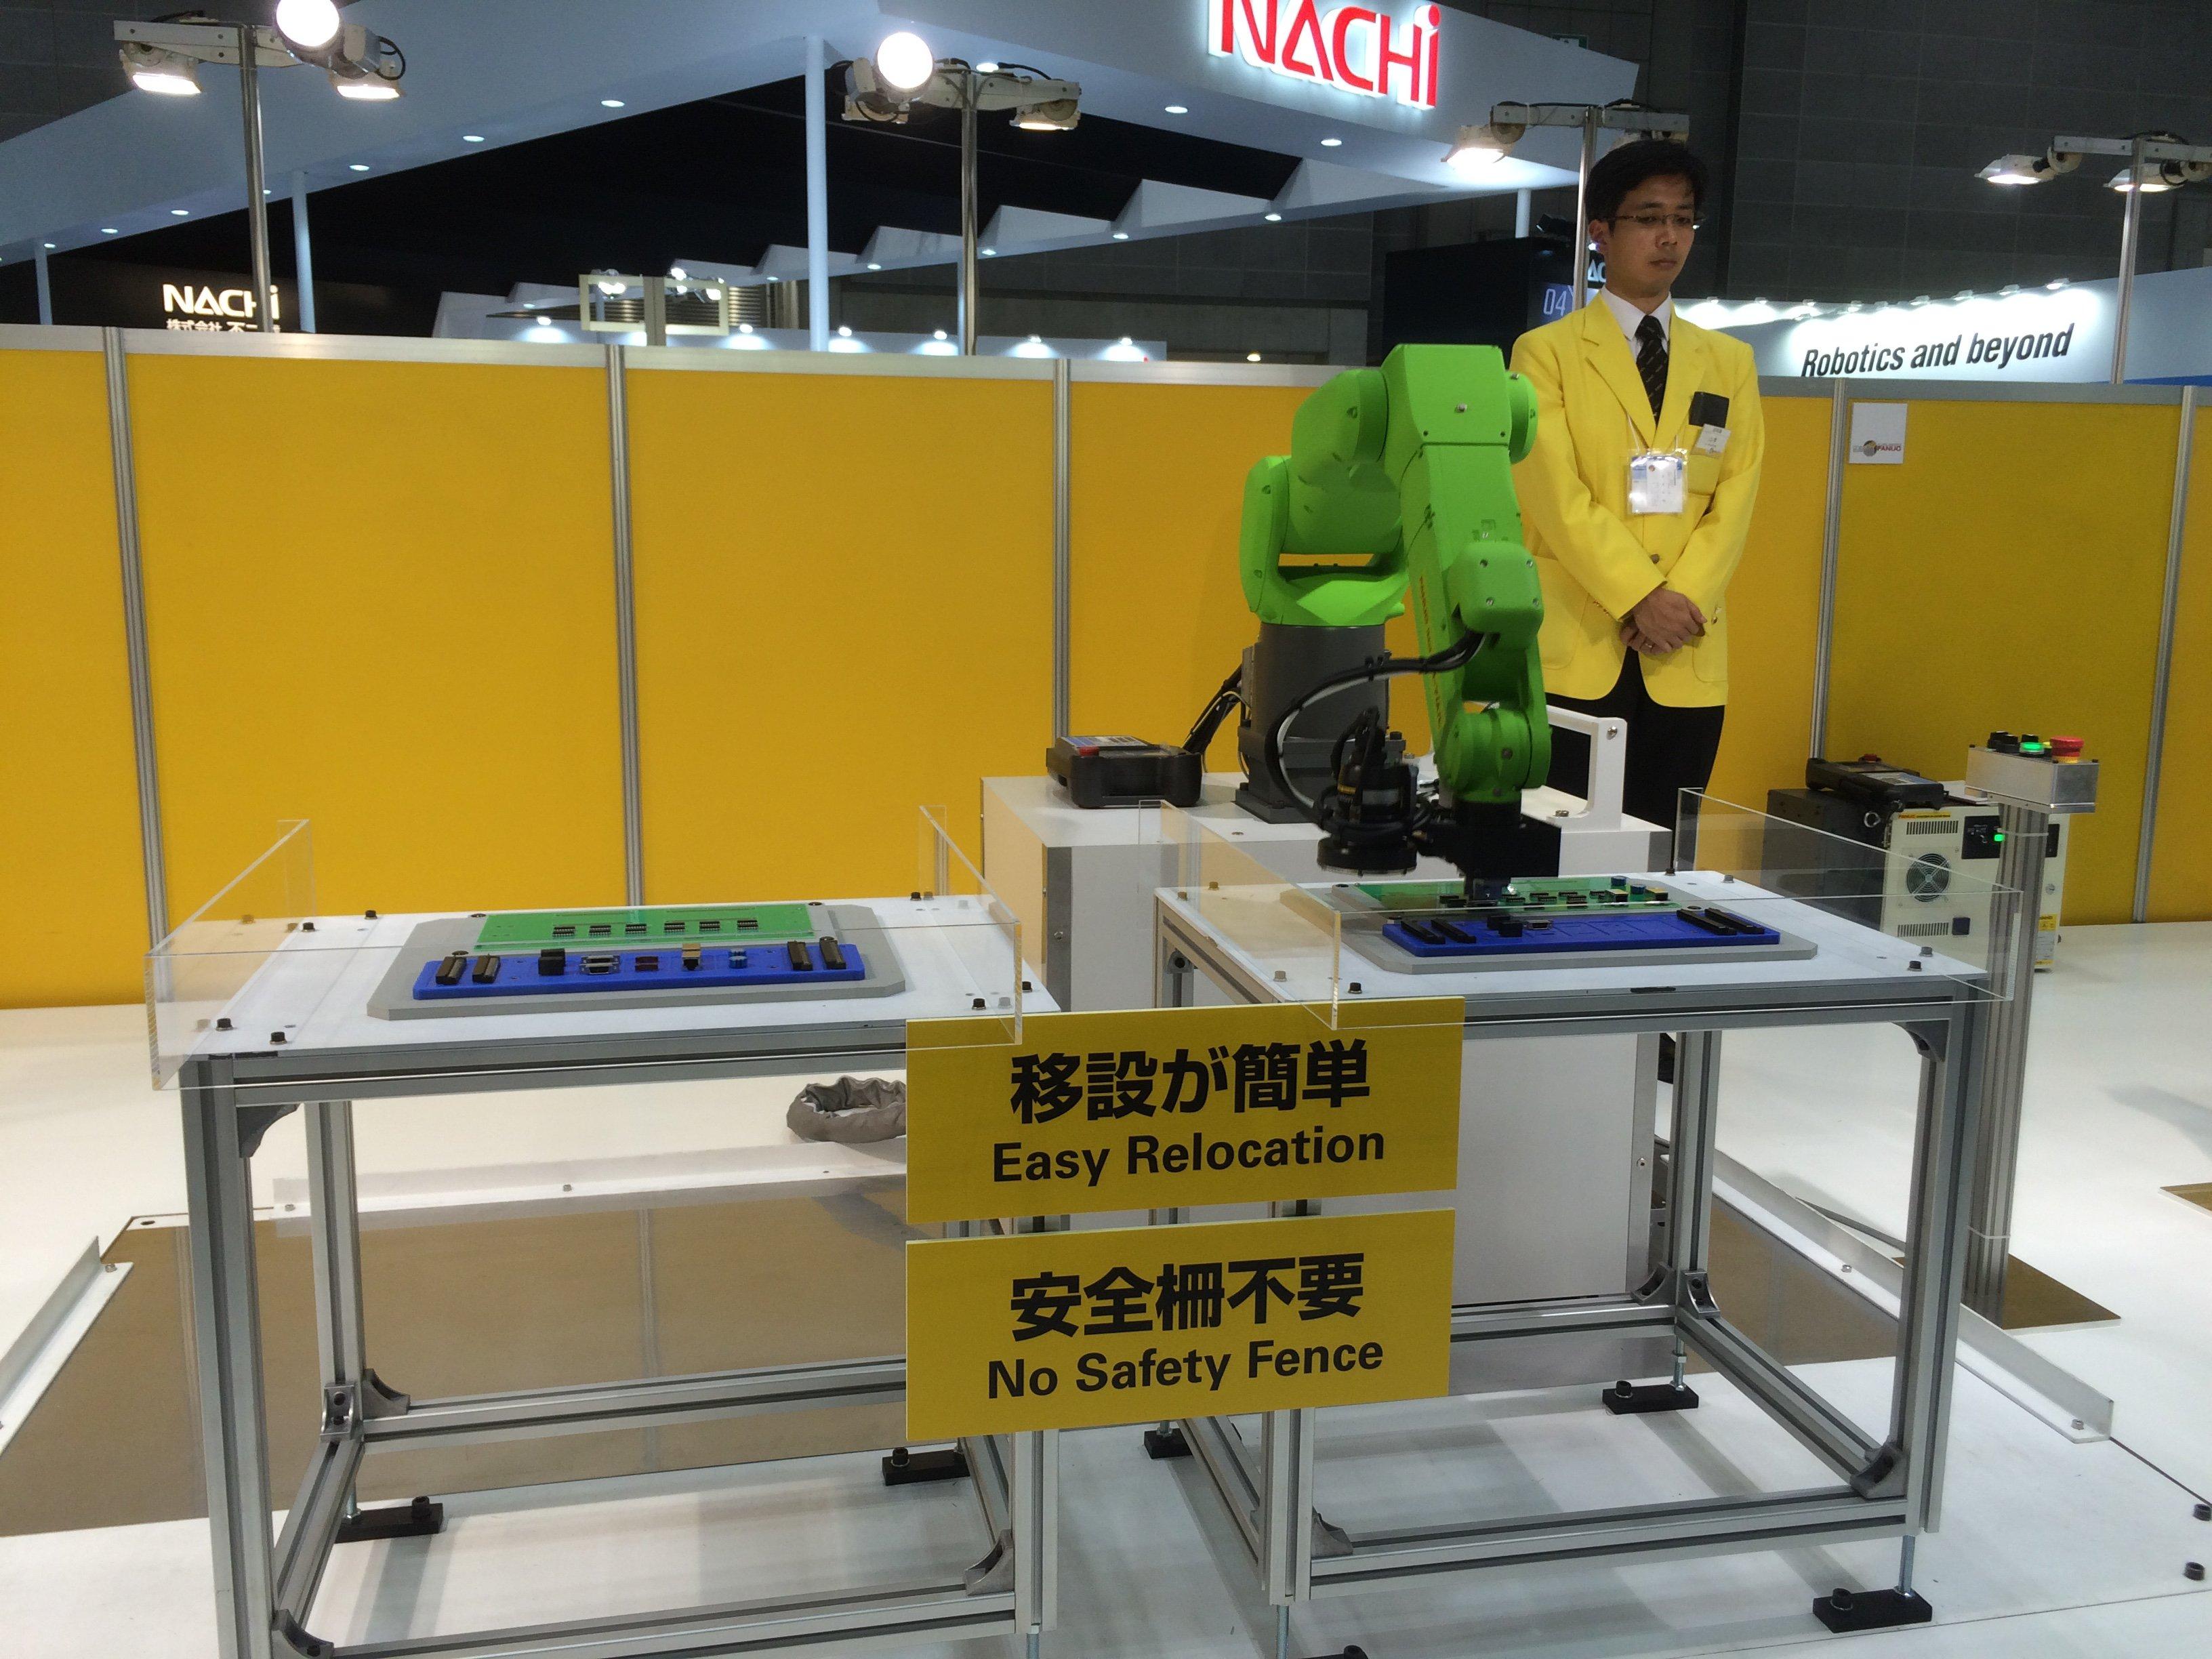 fanuc-collaborative-robot